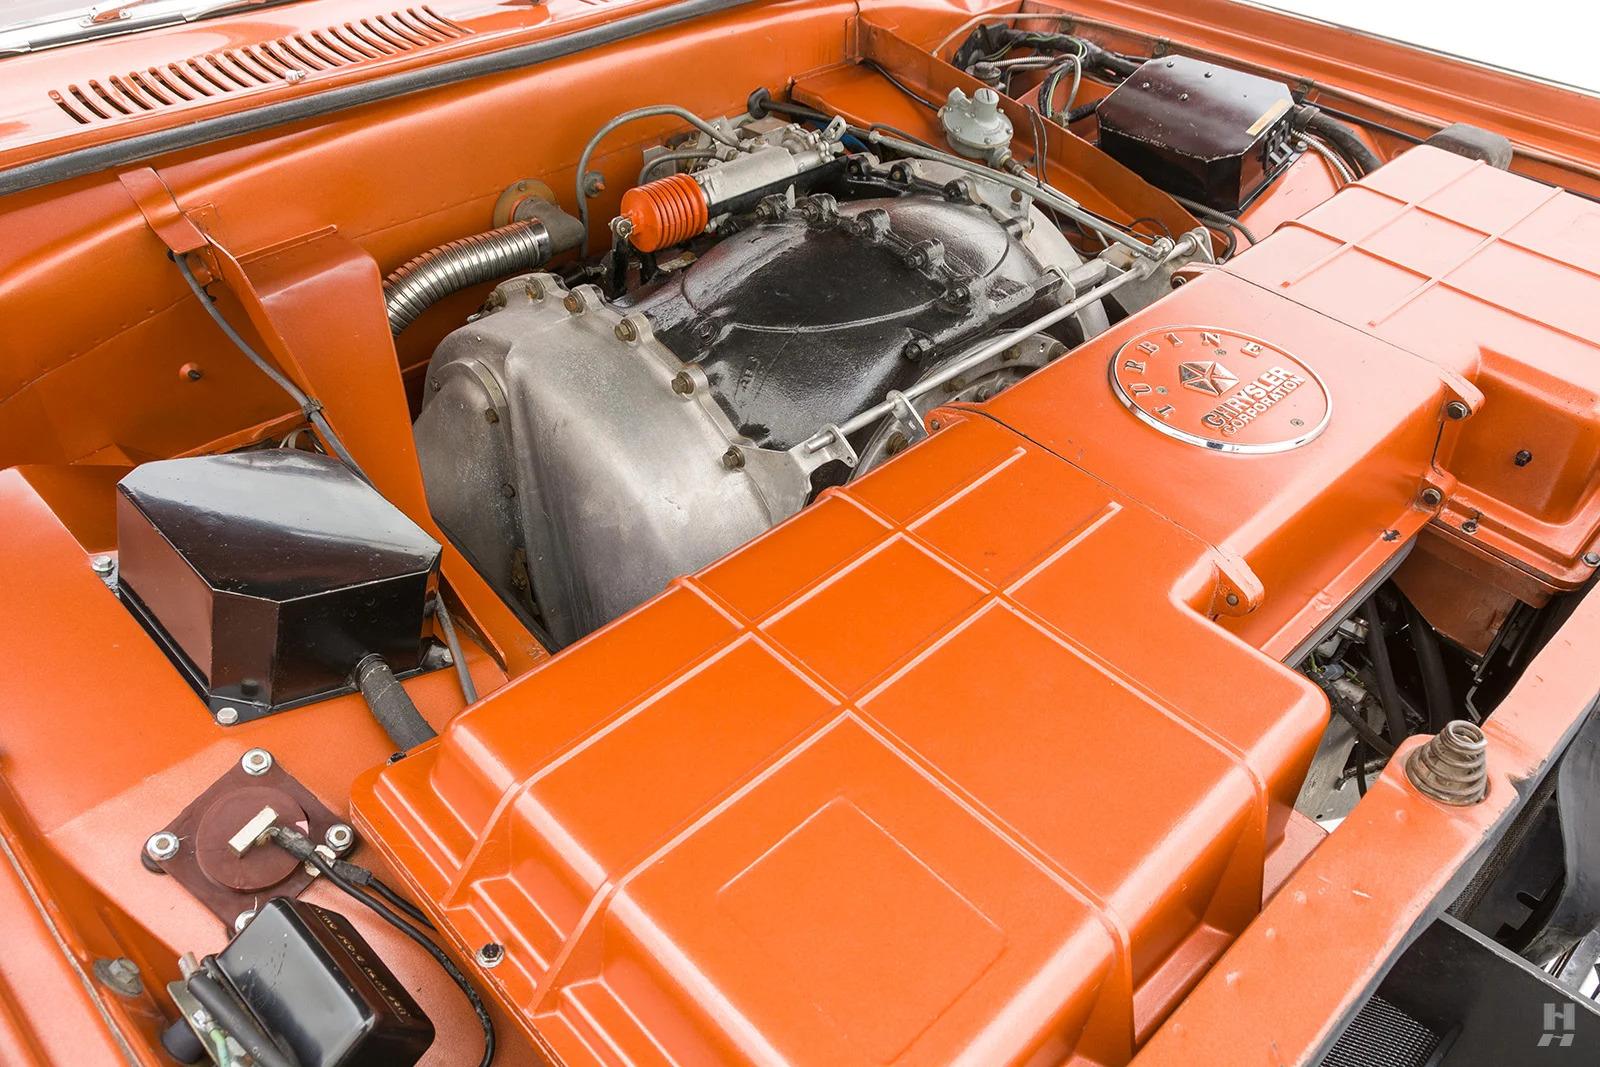 1963 Chrysler Turbine Car engine bay